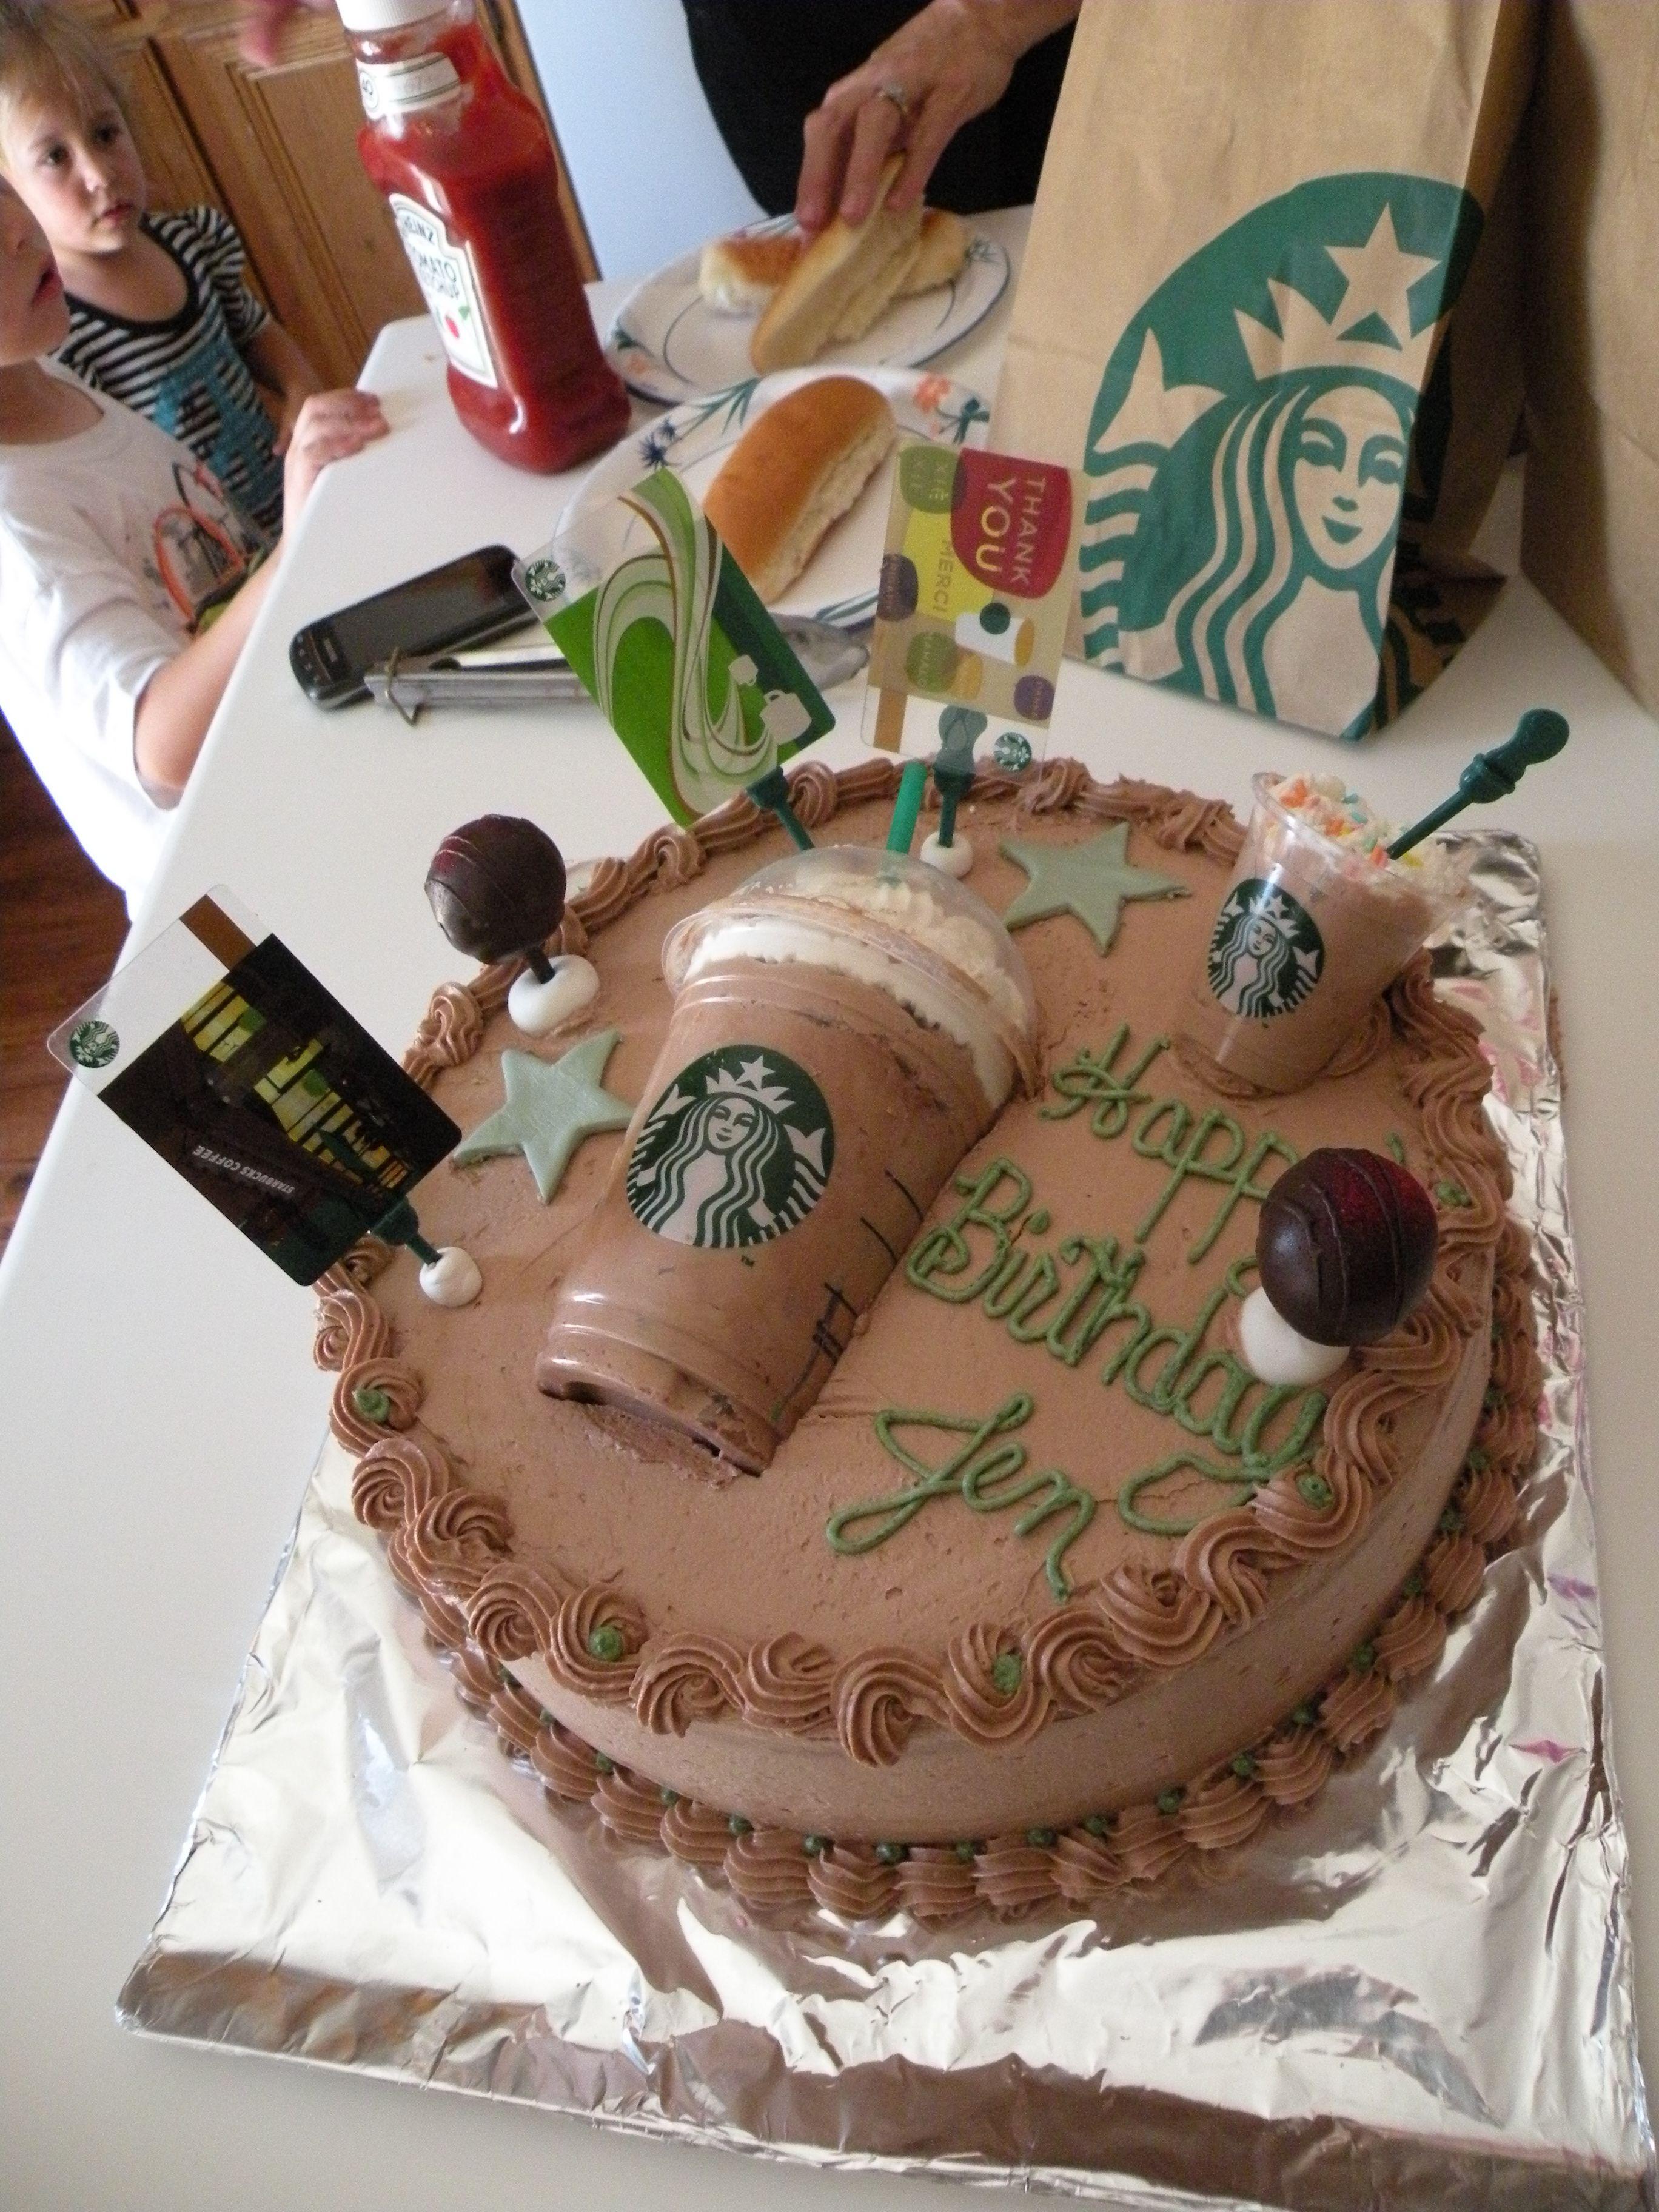 Starbucks cake made by Labella Starbucks